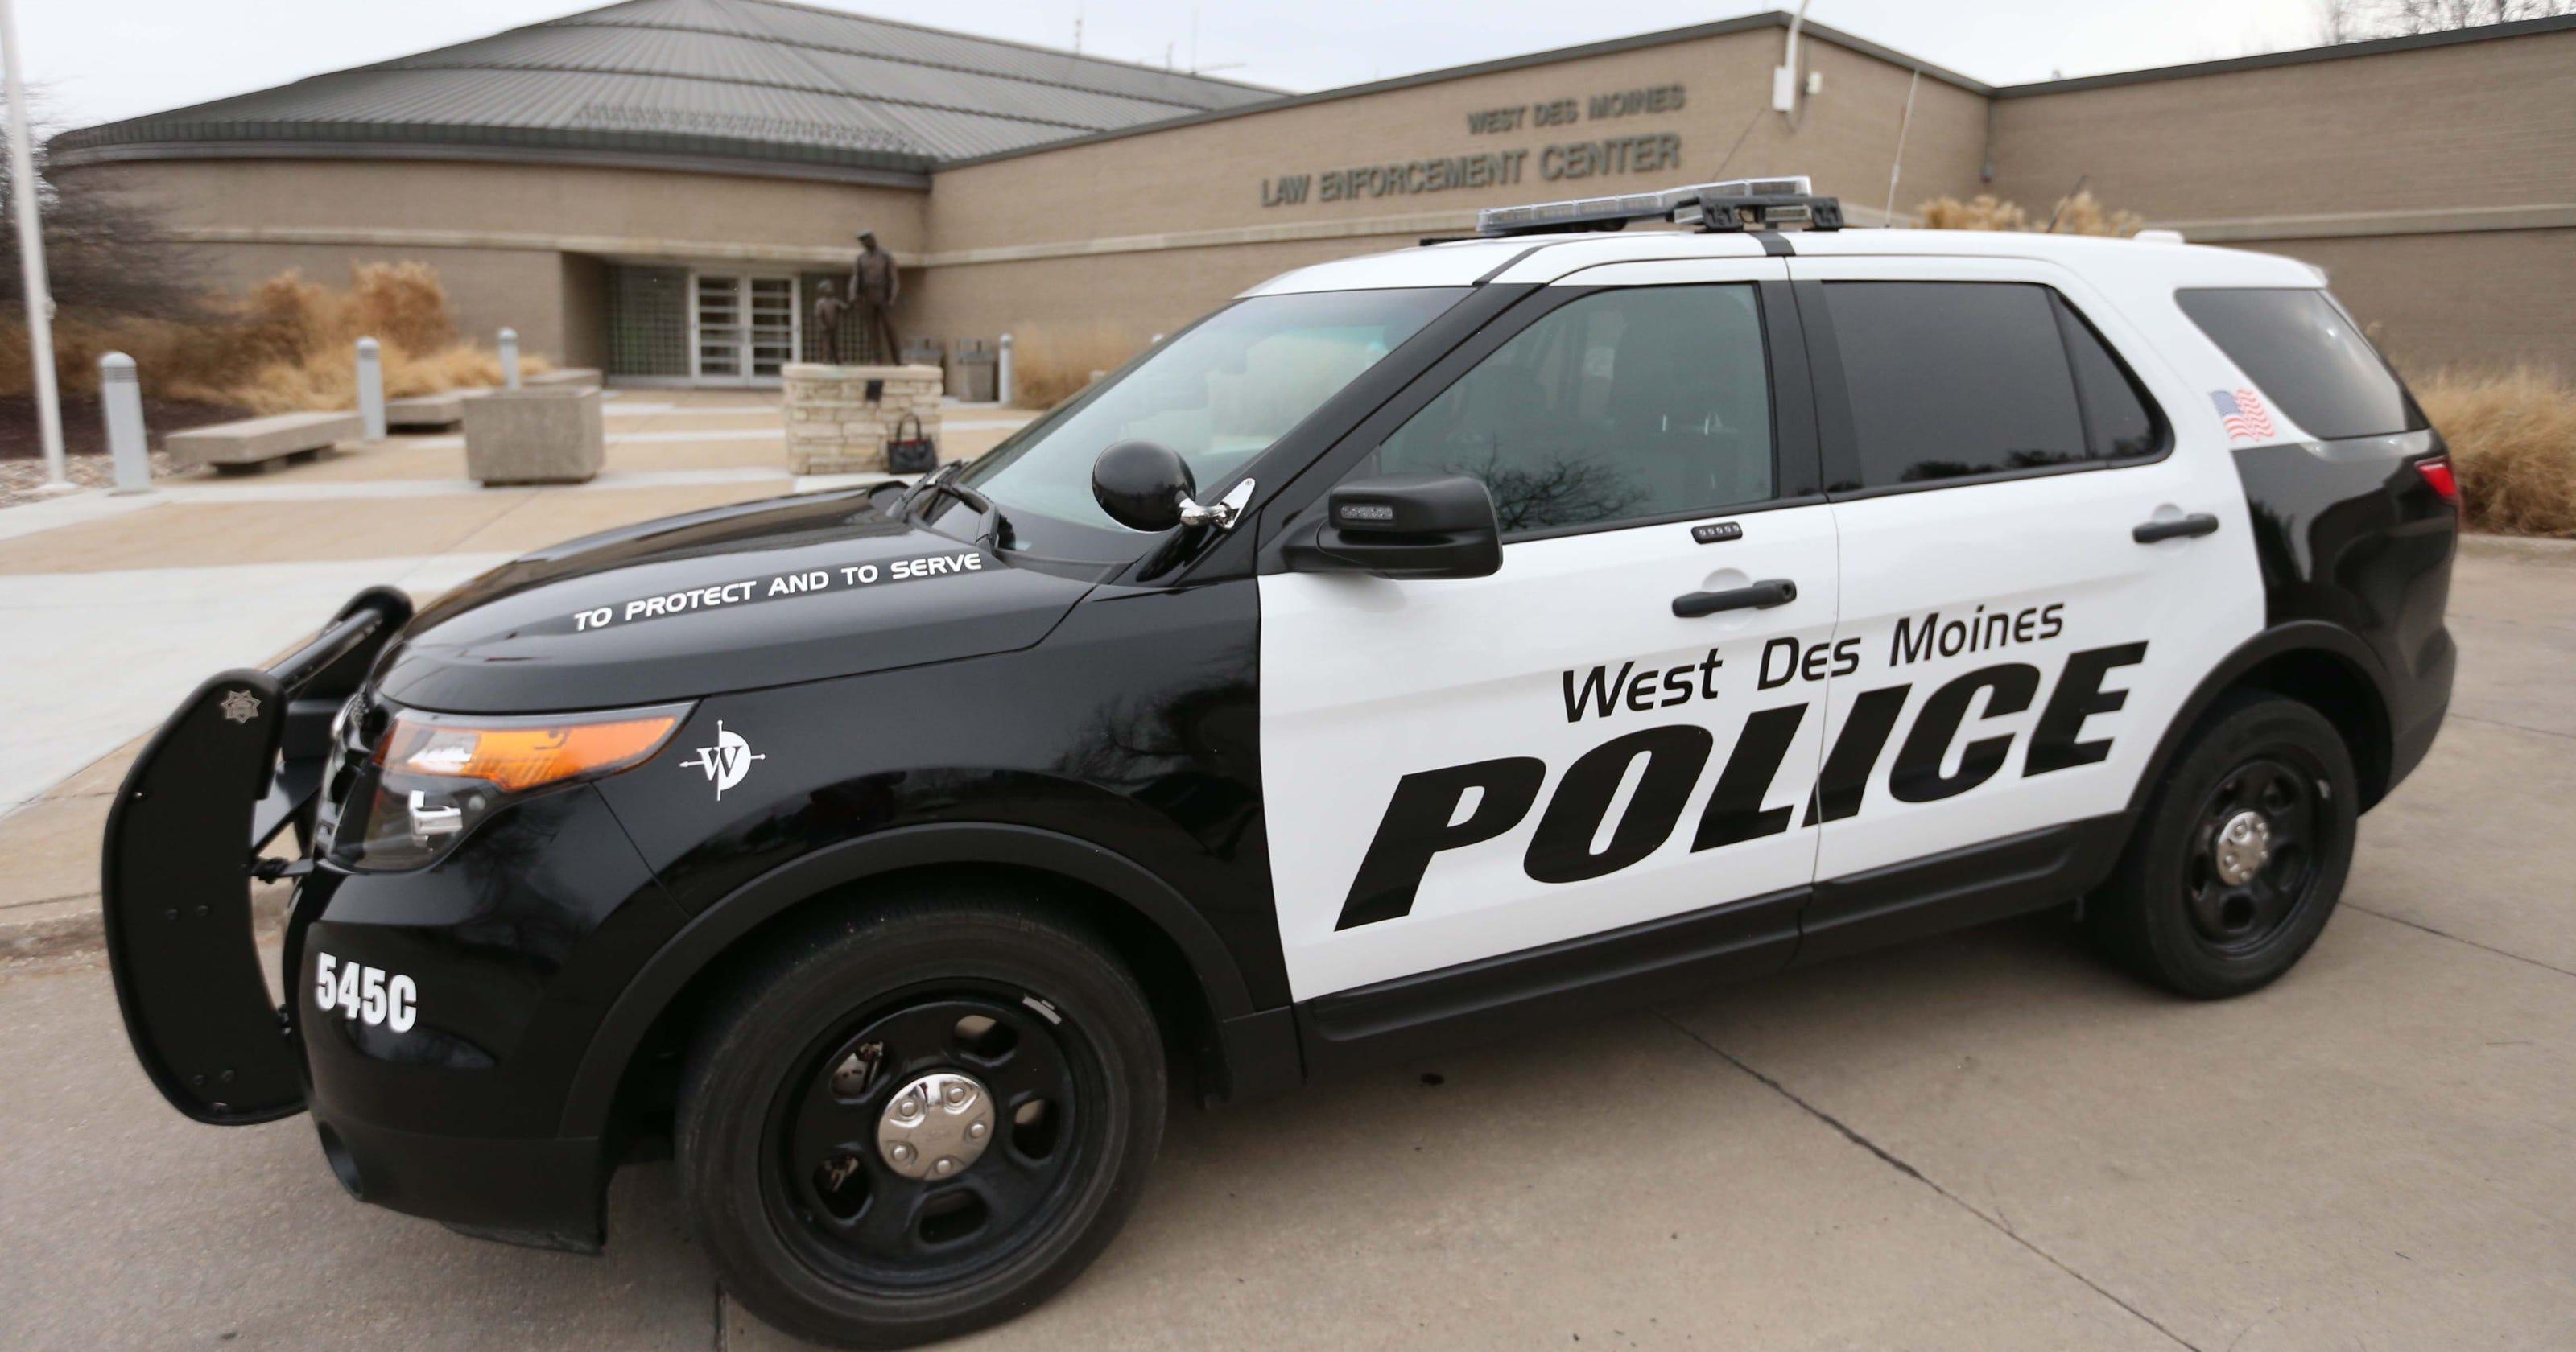 Photo courtesy: West Des Moines police department website